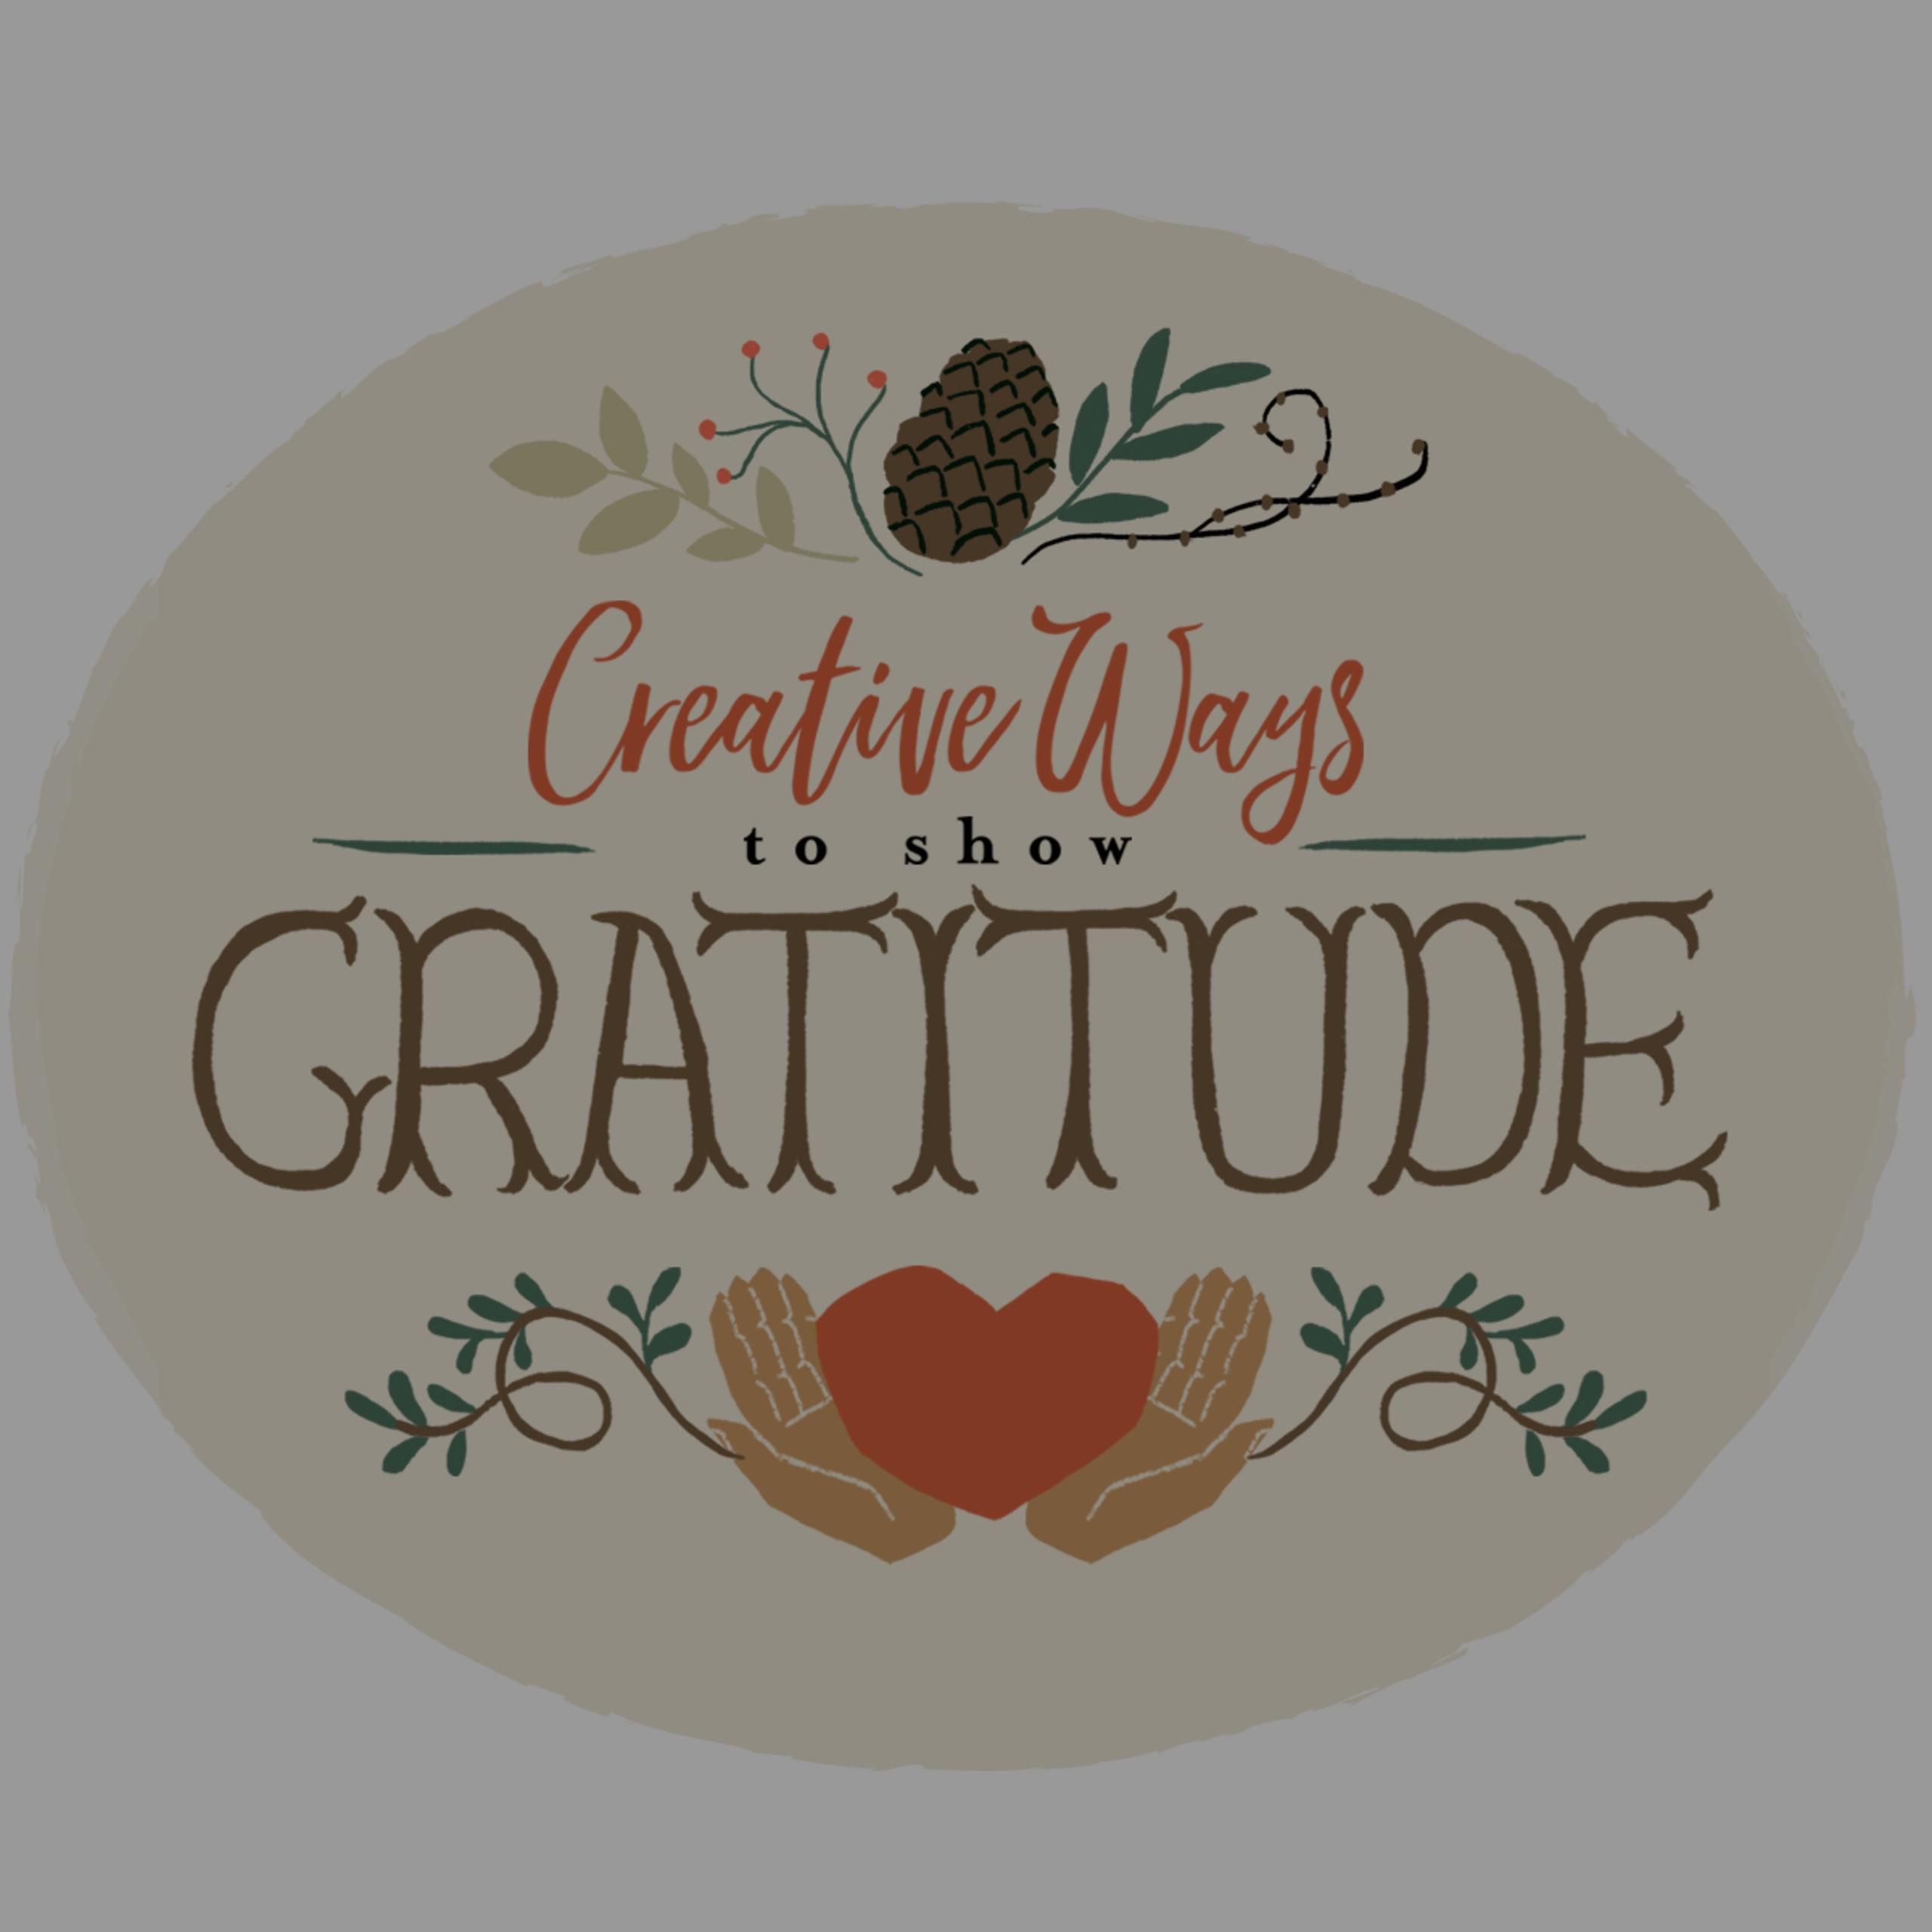 Creative Ways to Show Gratitude